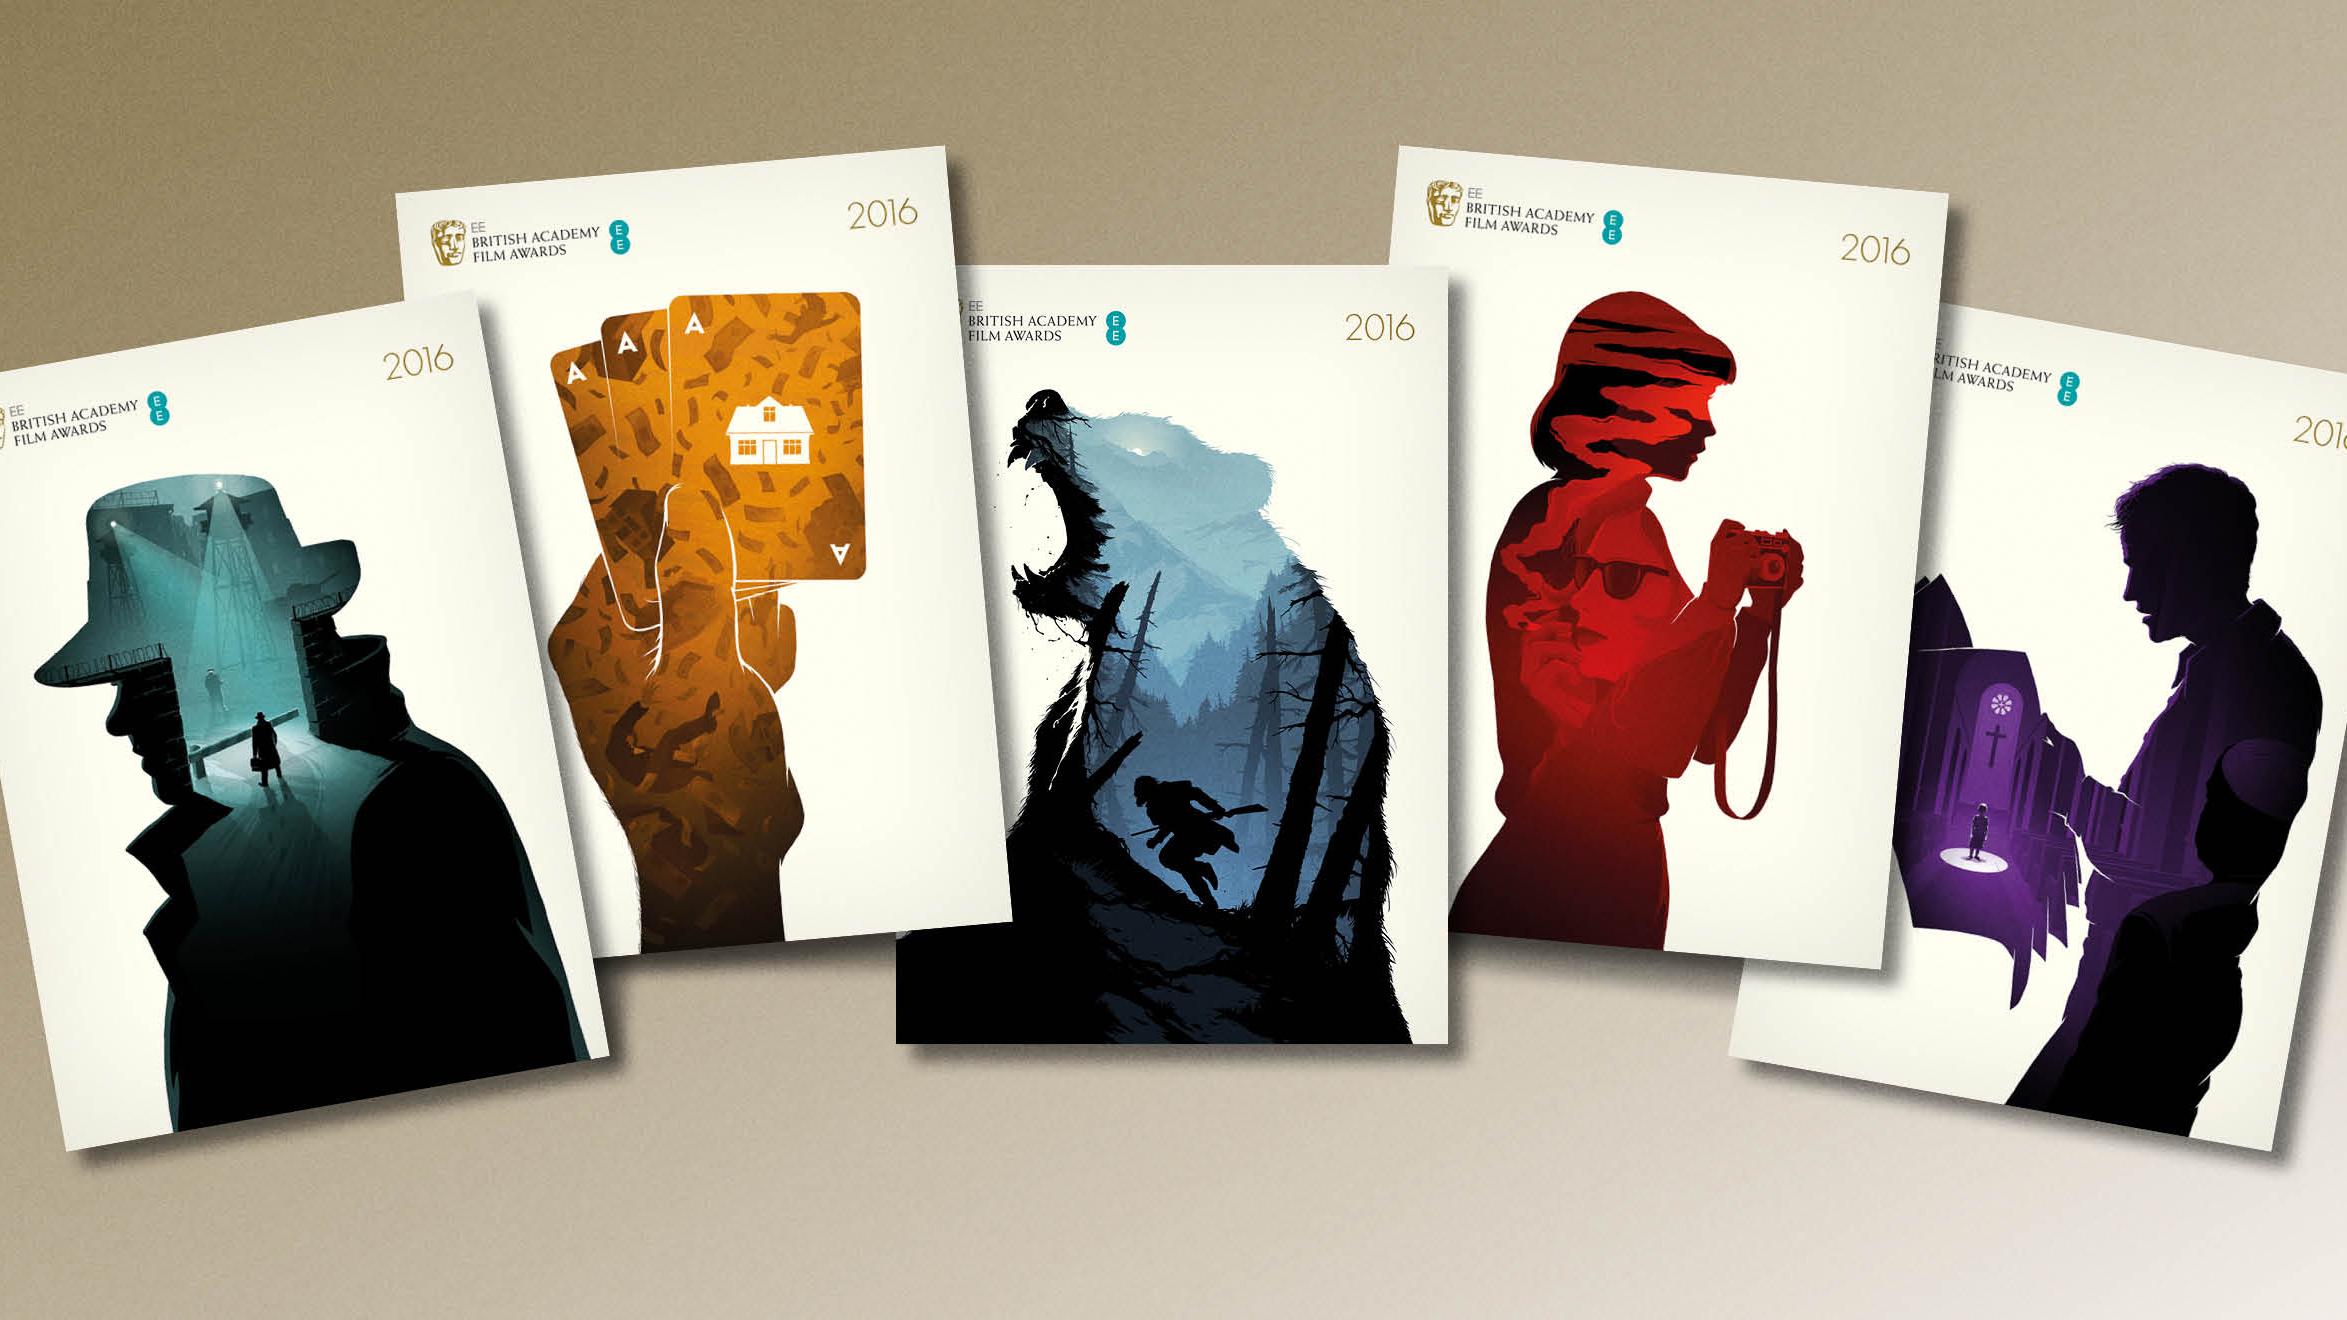 Brochure Design Top Creative Tips Creative Bloq - Free online brochure design templates